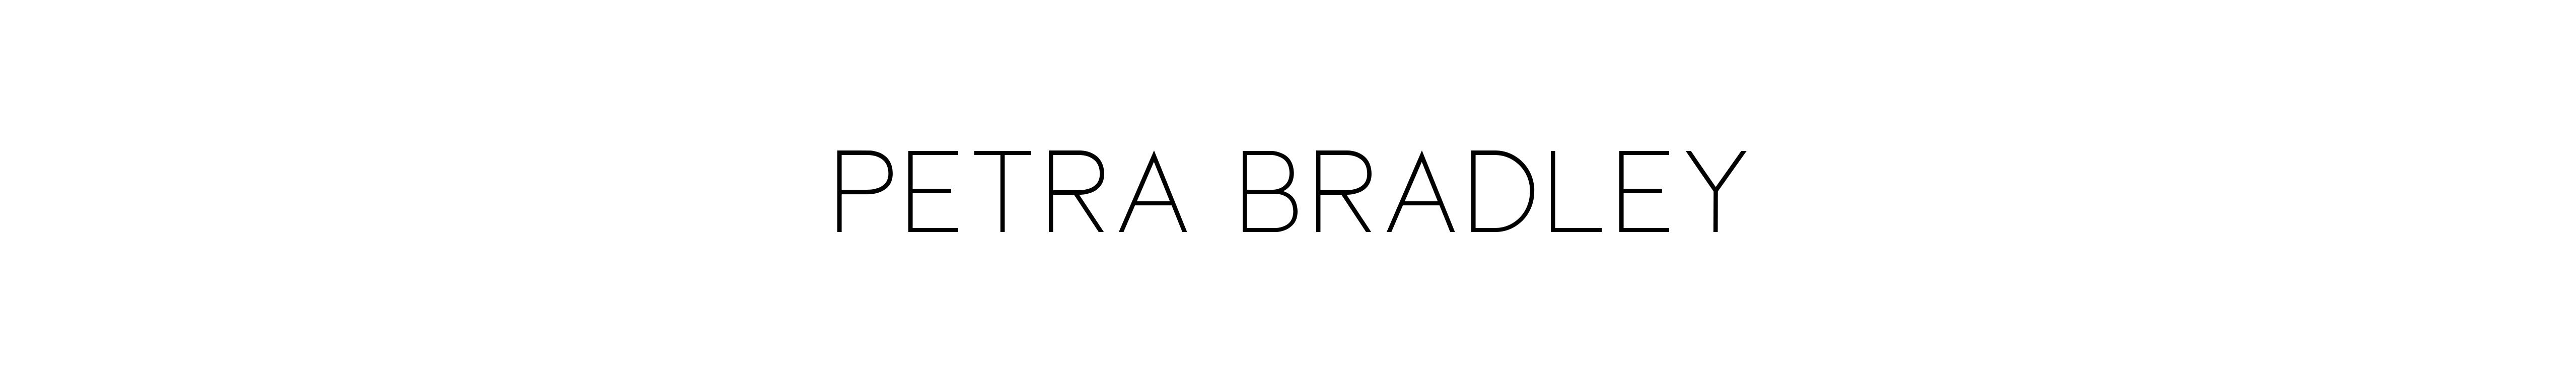 Petra Bradley